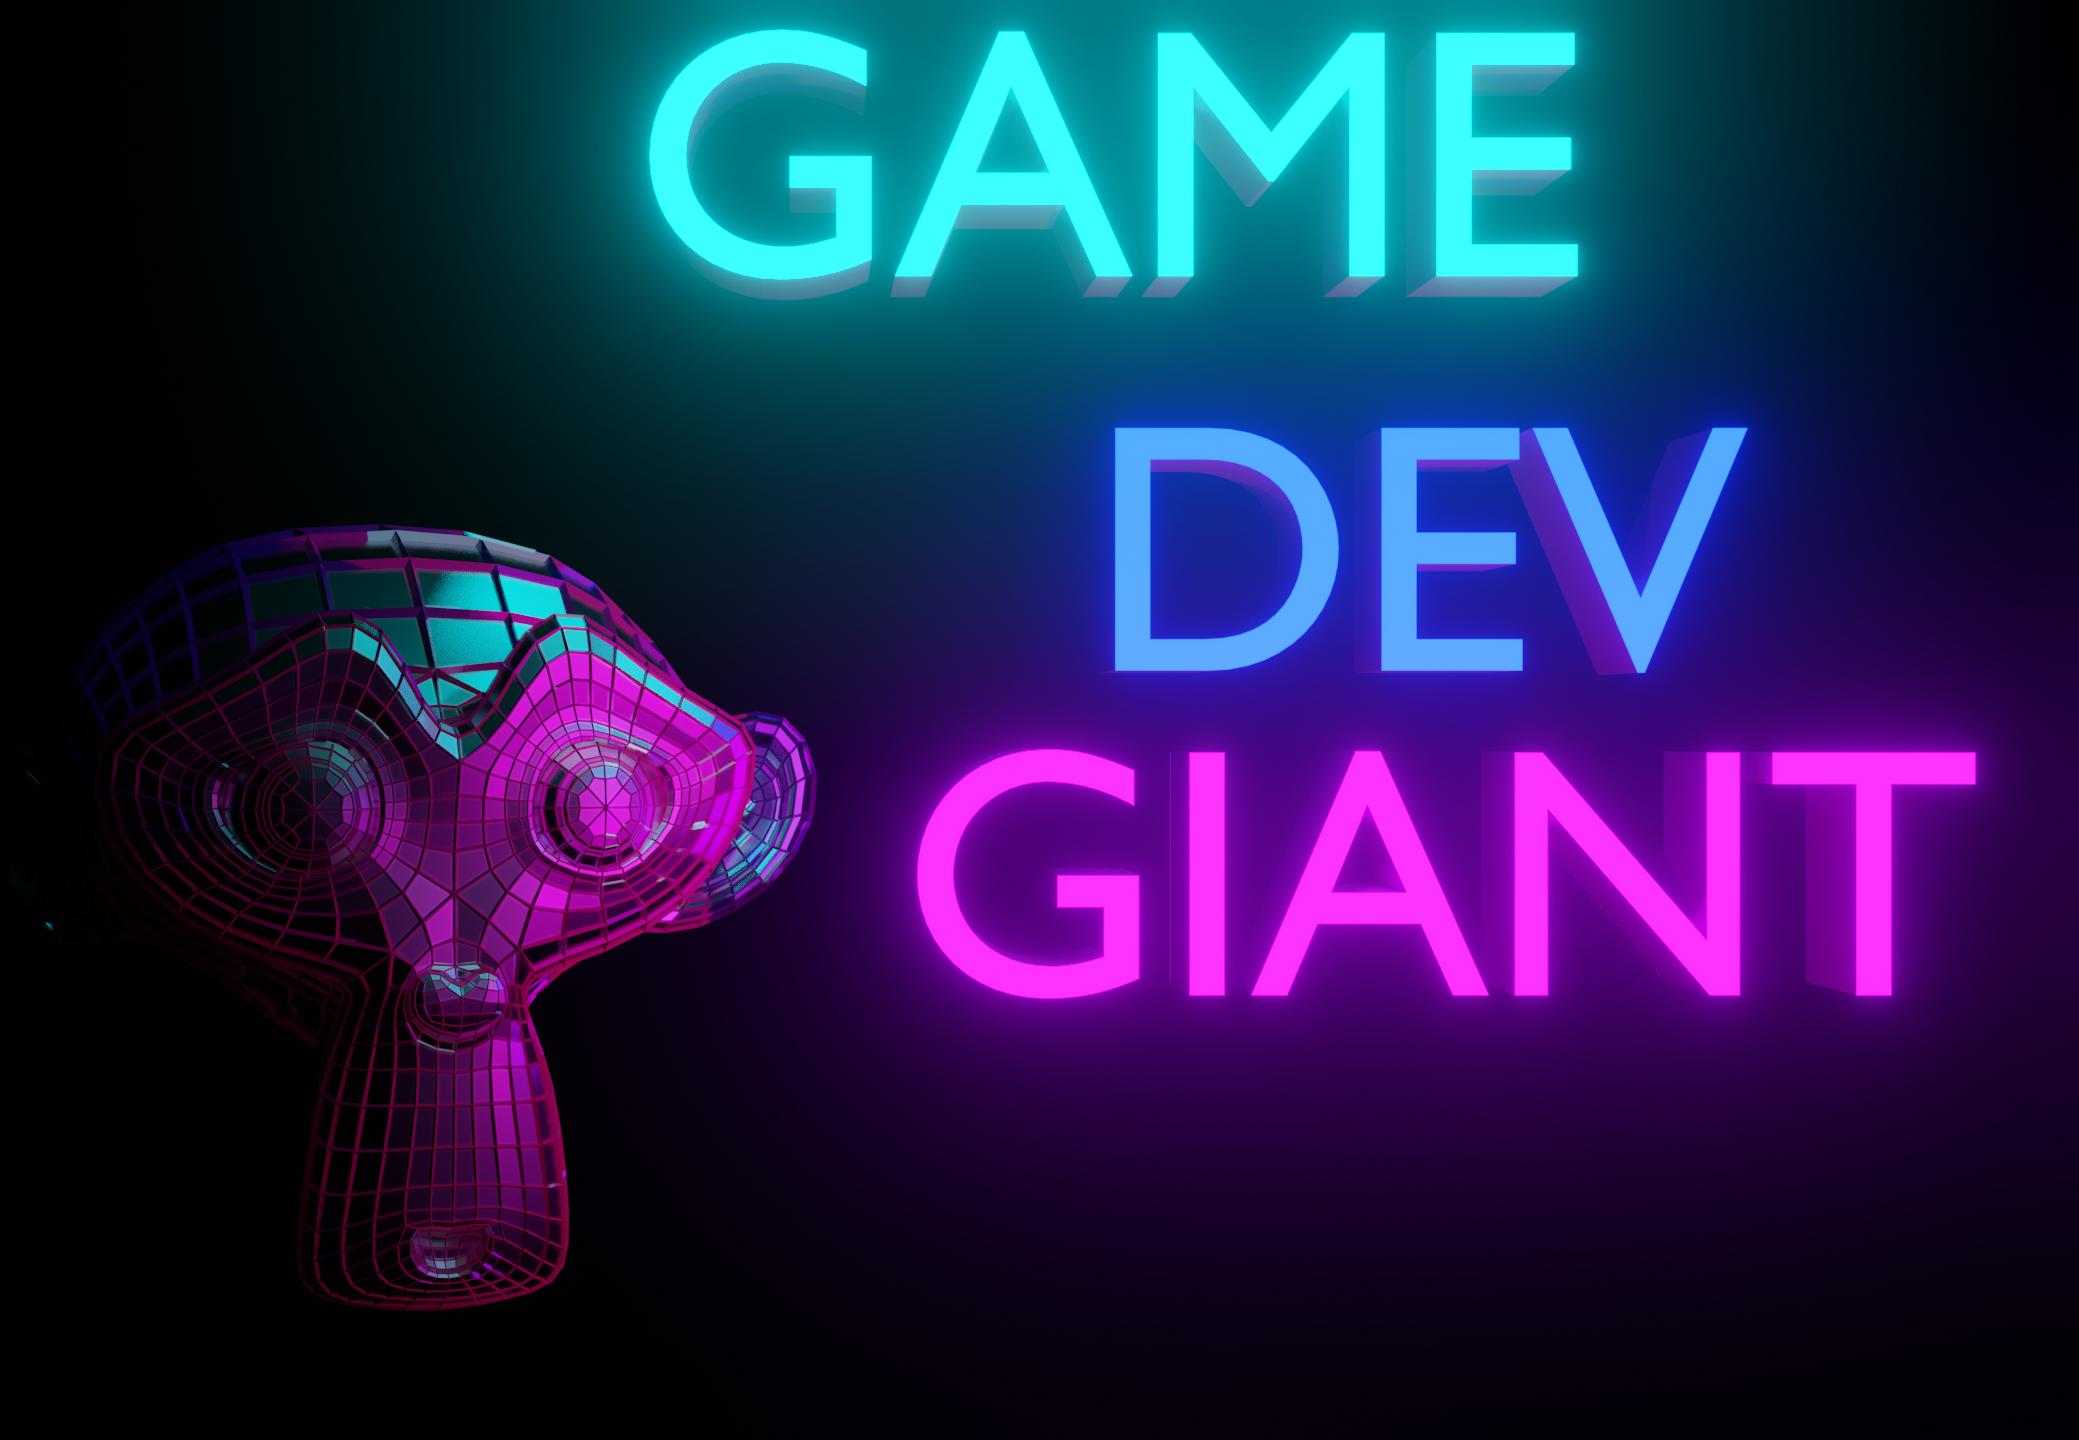 GameDev Giant